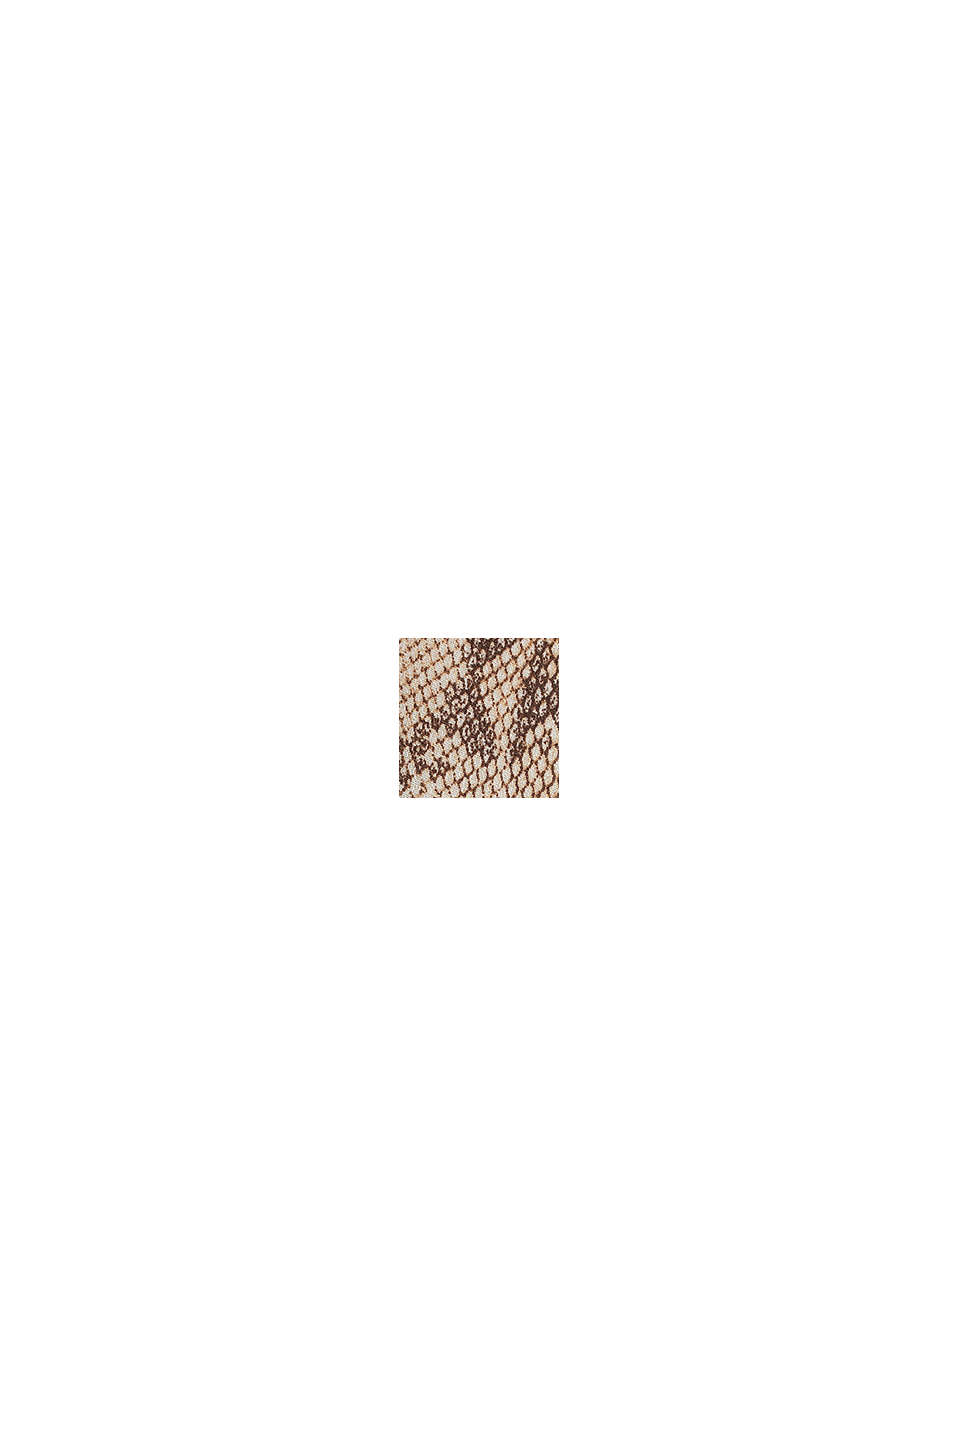 Chiffon rok met slangenprint, LIGHT TAUPE, swatch